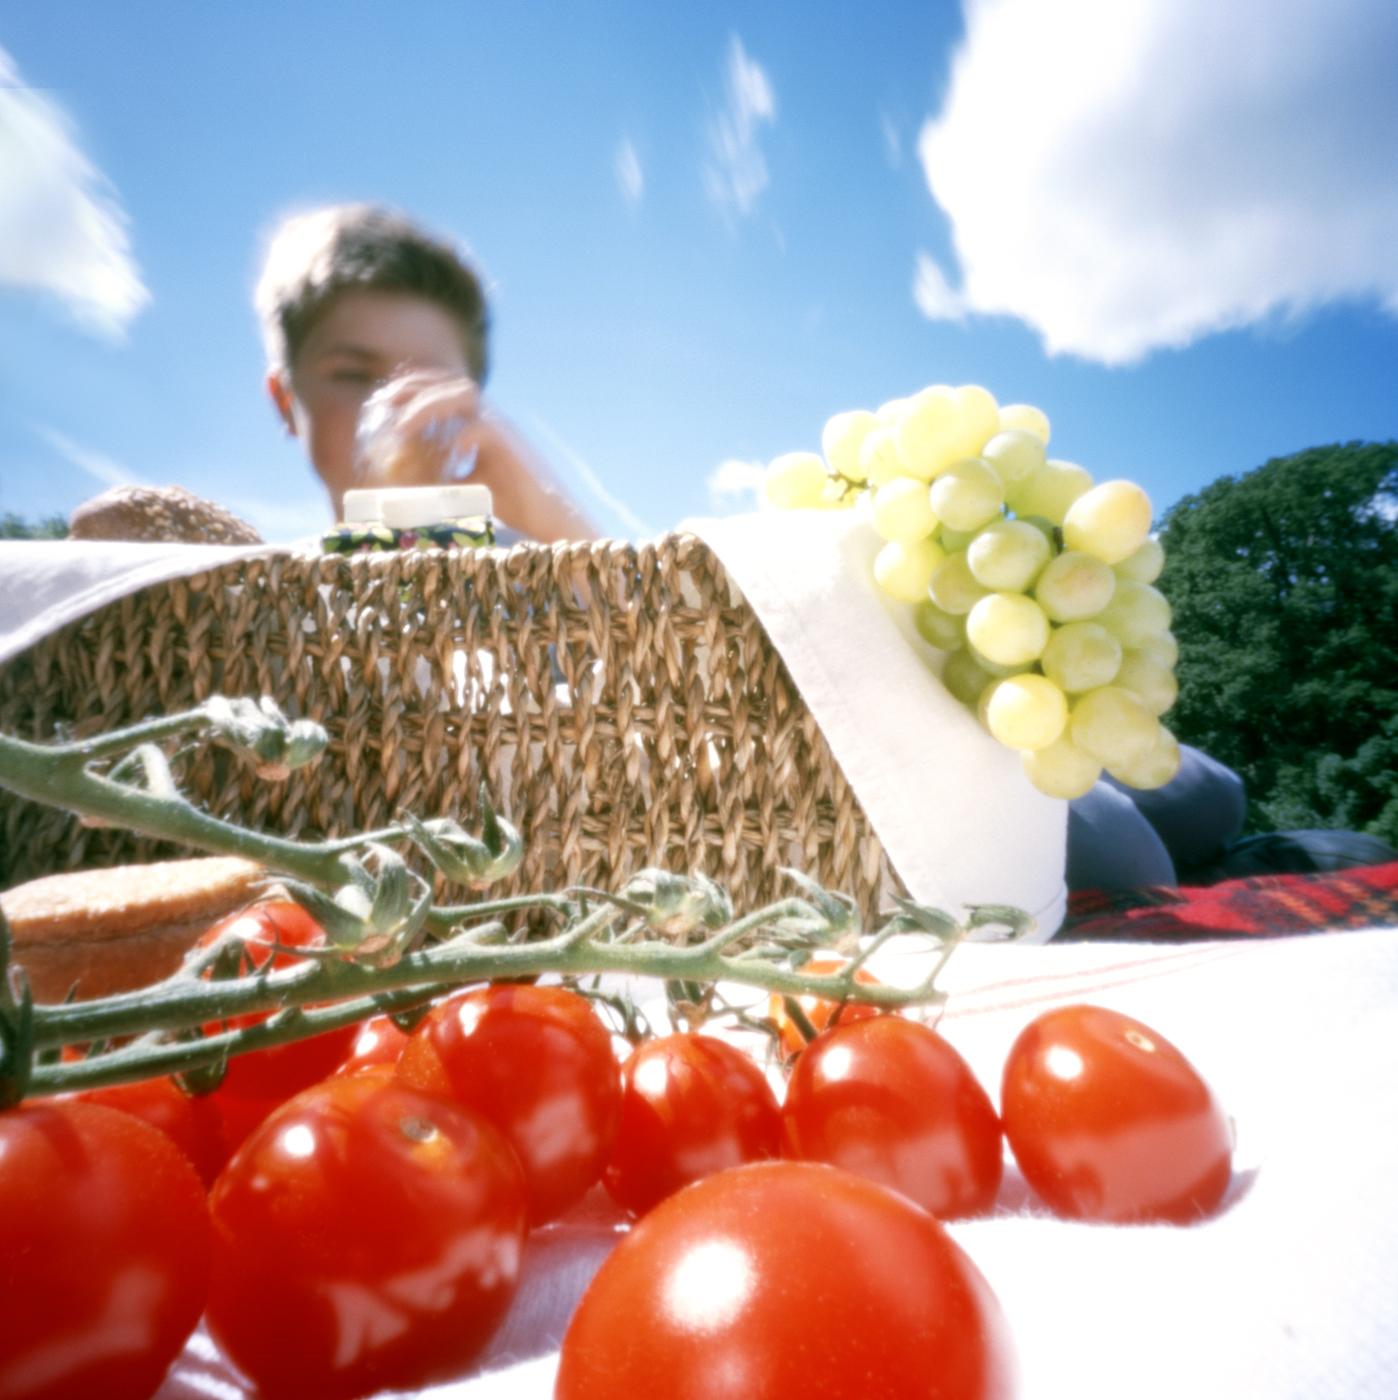 Nadege_picnic